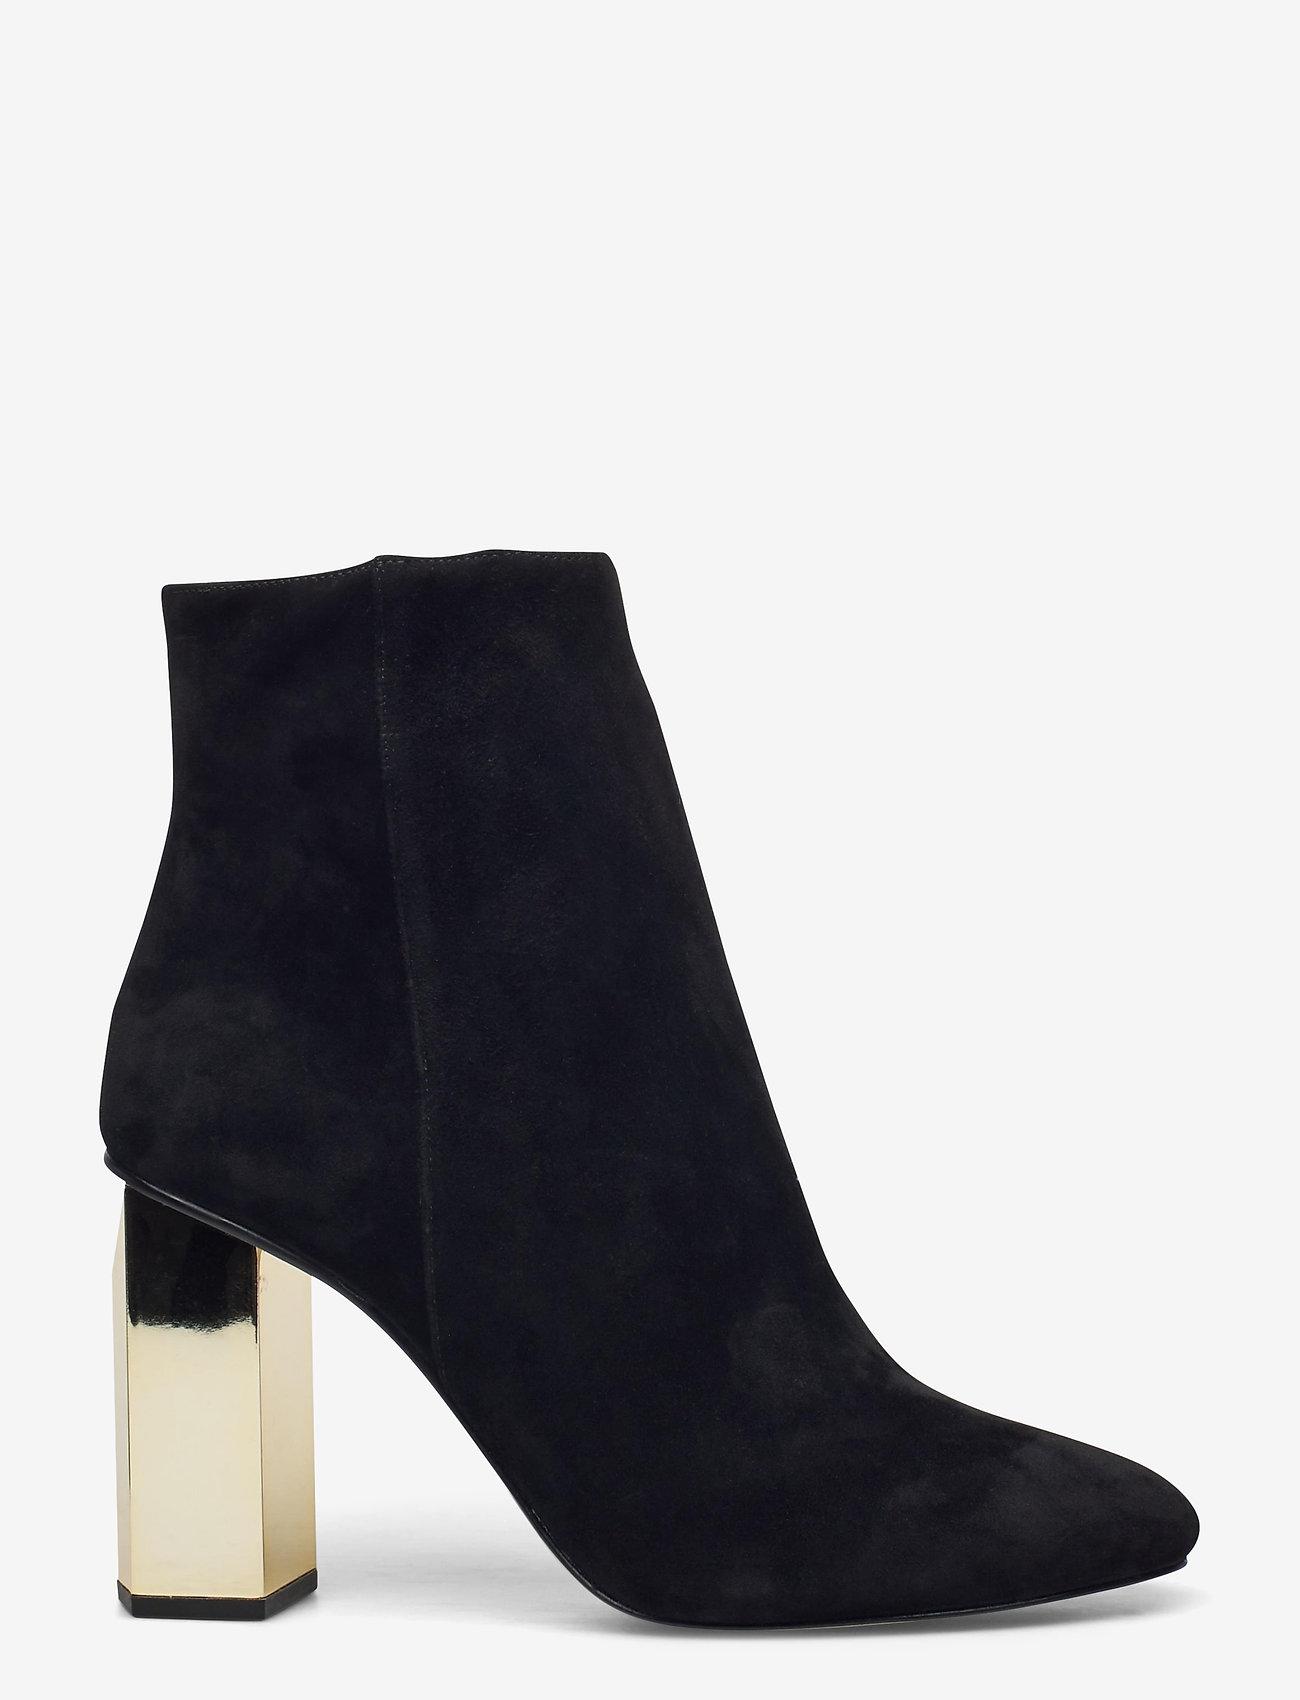 Michael Kors Shoes - PETRA BOOTIE - enkellaarsjes met hak - black - 1